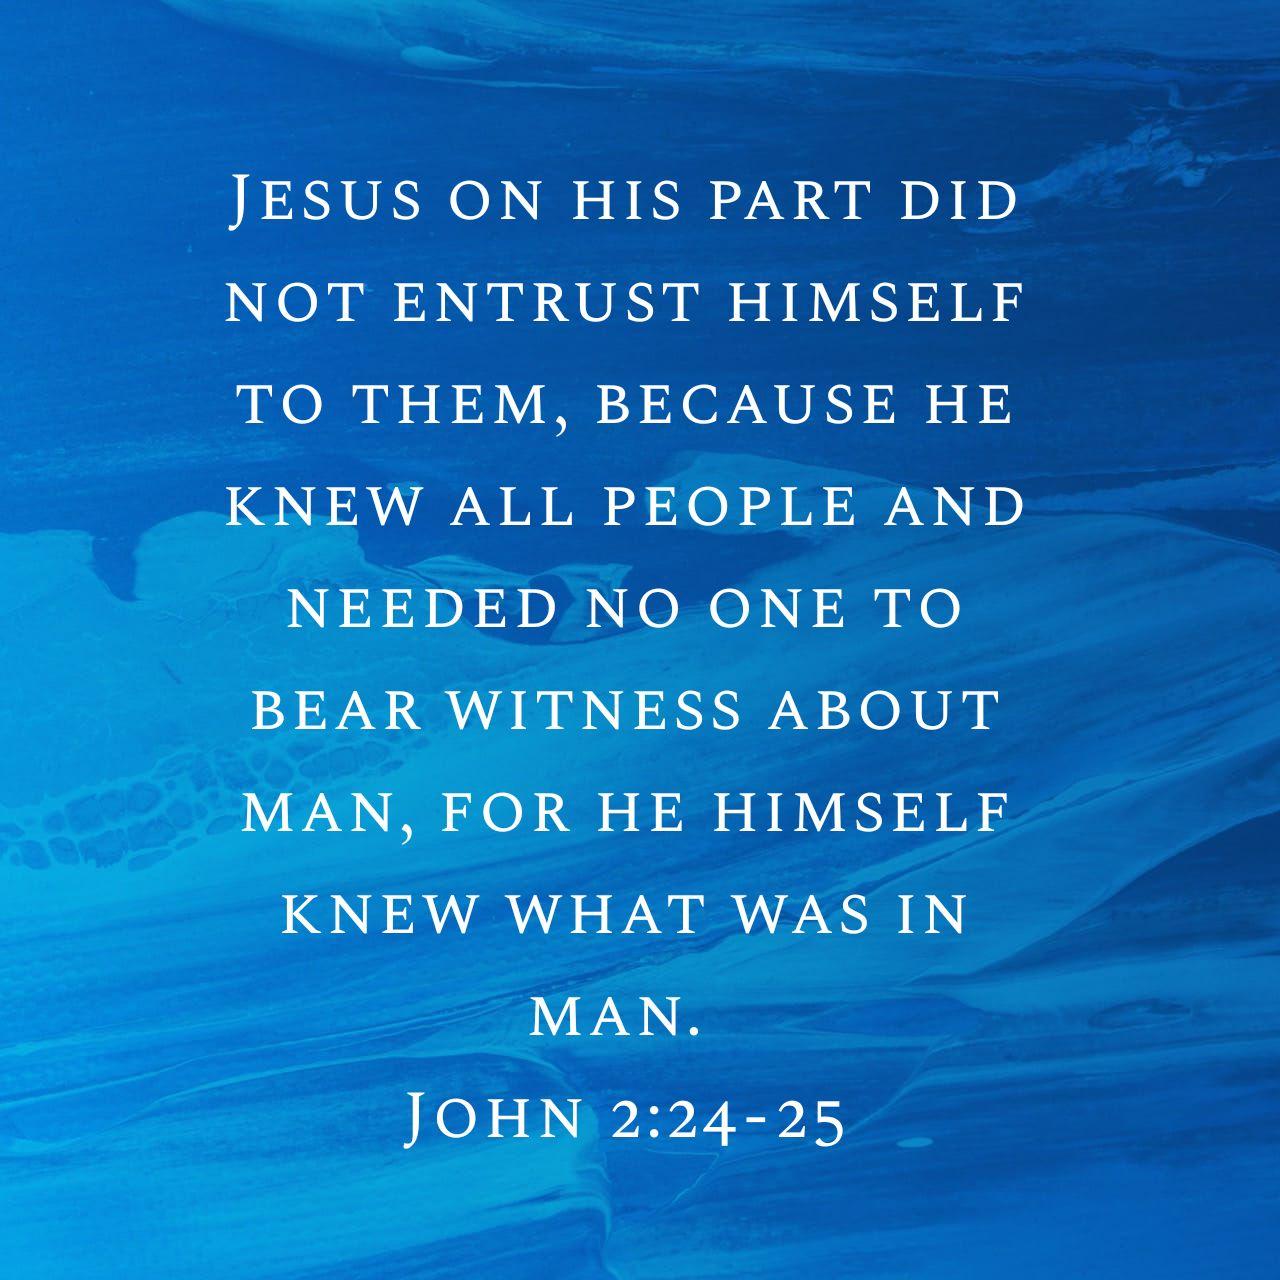 Daily Bible Reading: John 2